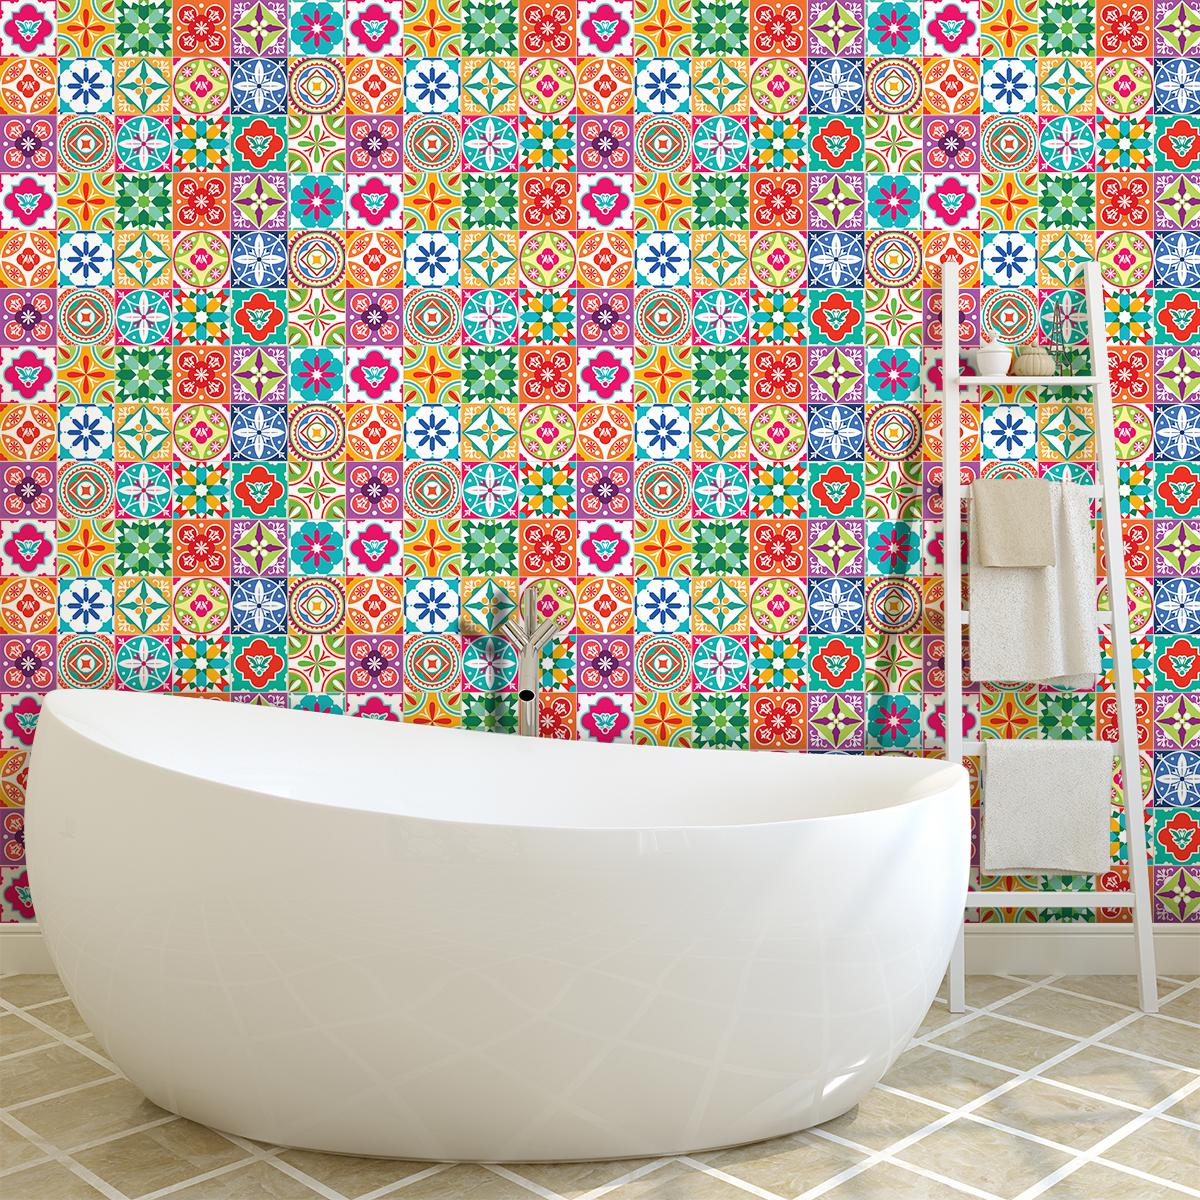 60 stickers carreaux de ciment azulejos claria cuisine. Black Bedroom Furniture Sets. Home Design Ideas